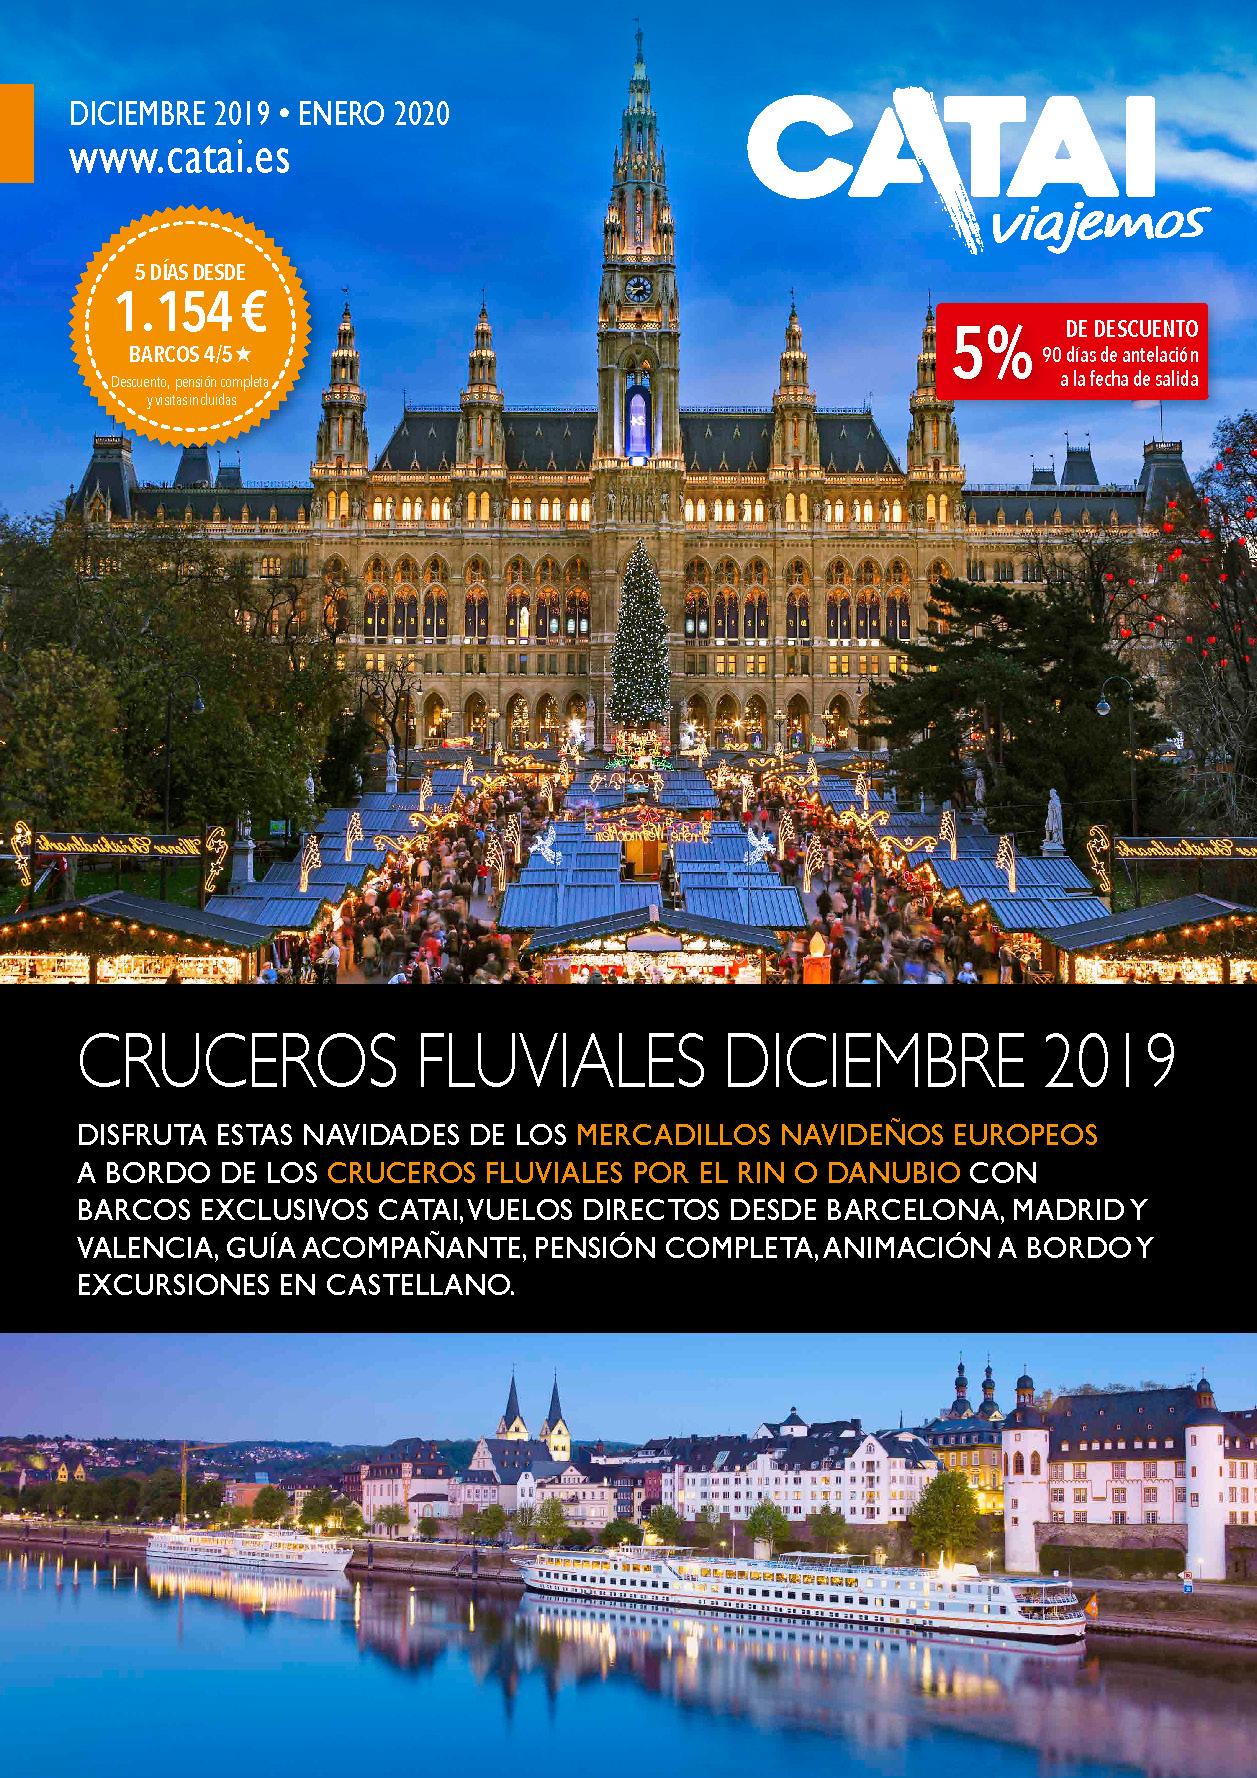 Diptico Catai Cruceros Fluviales Diciembre 2019